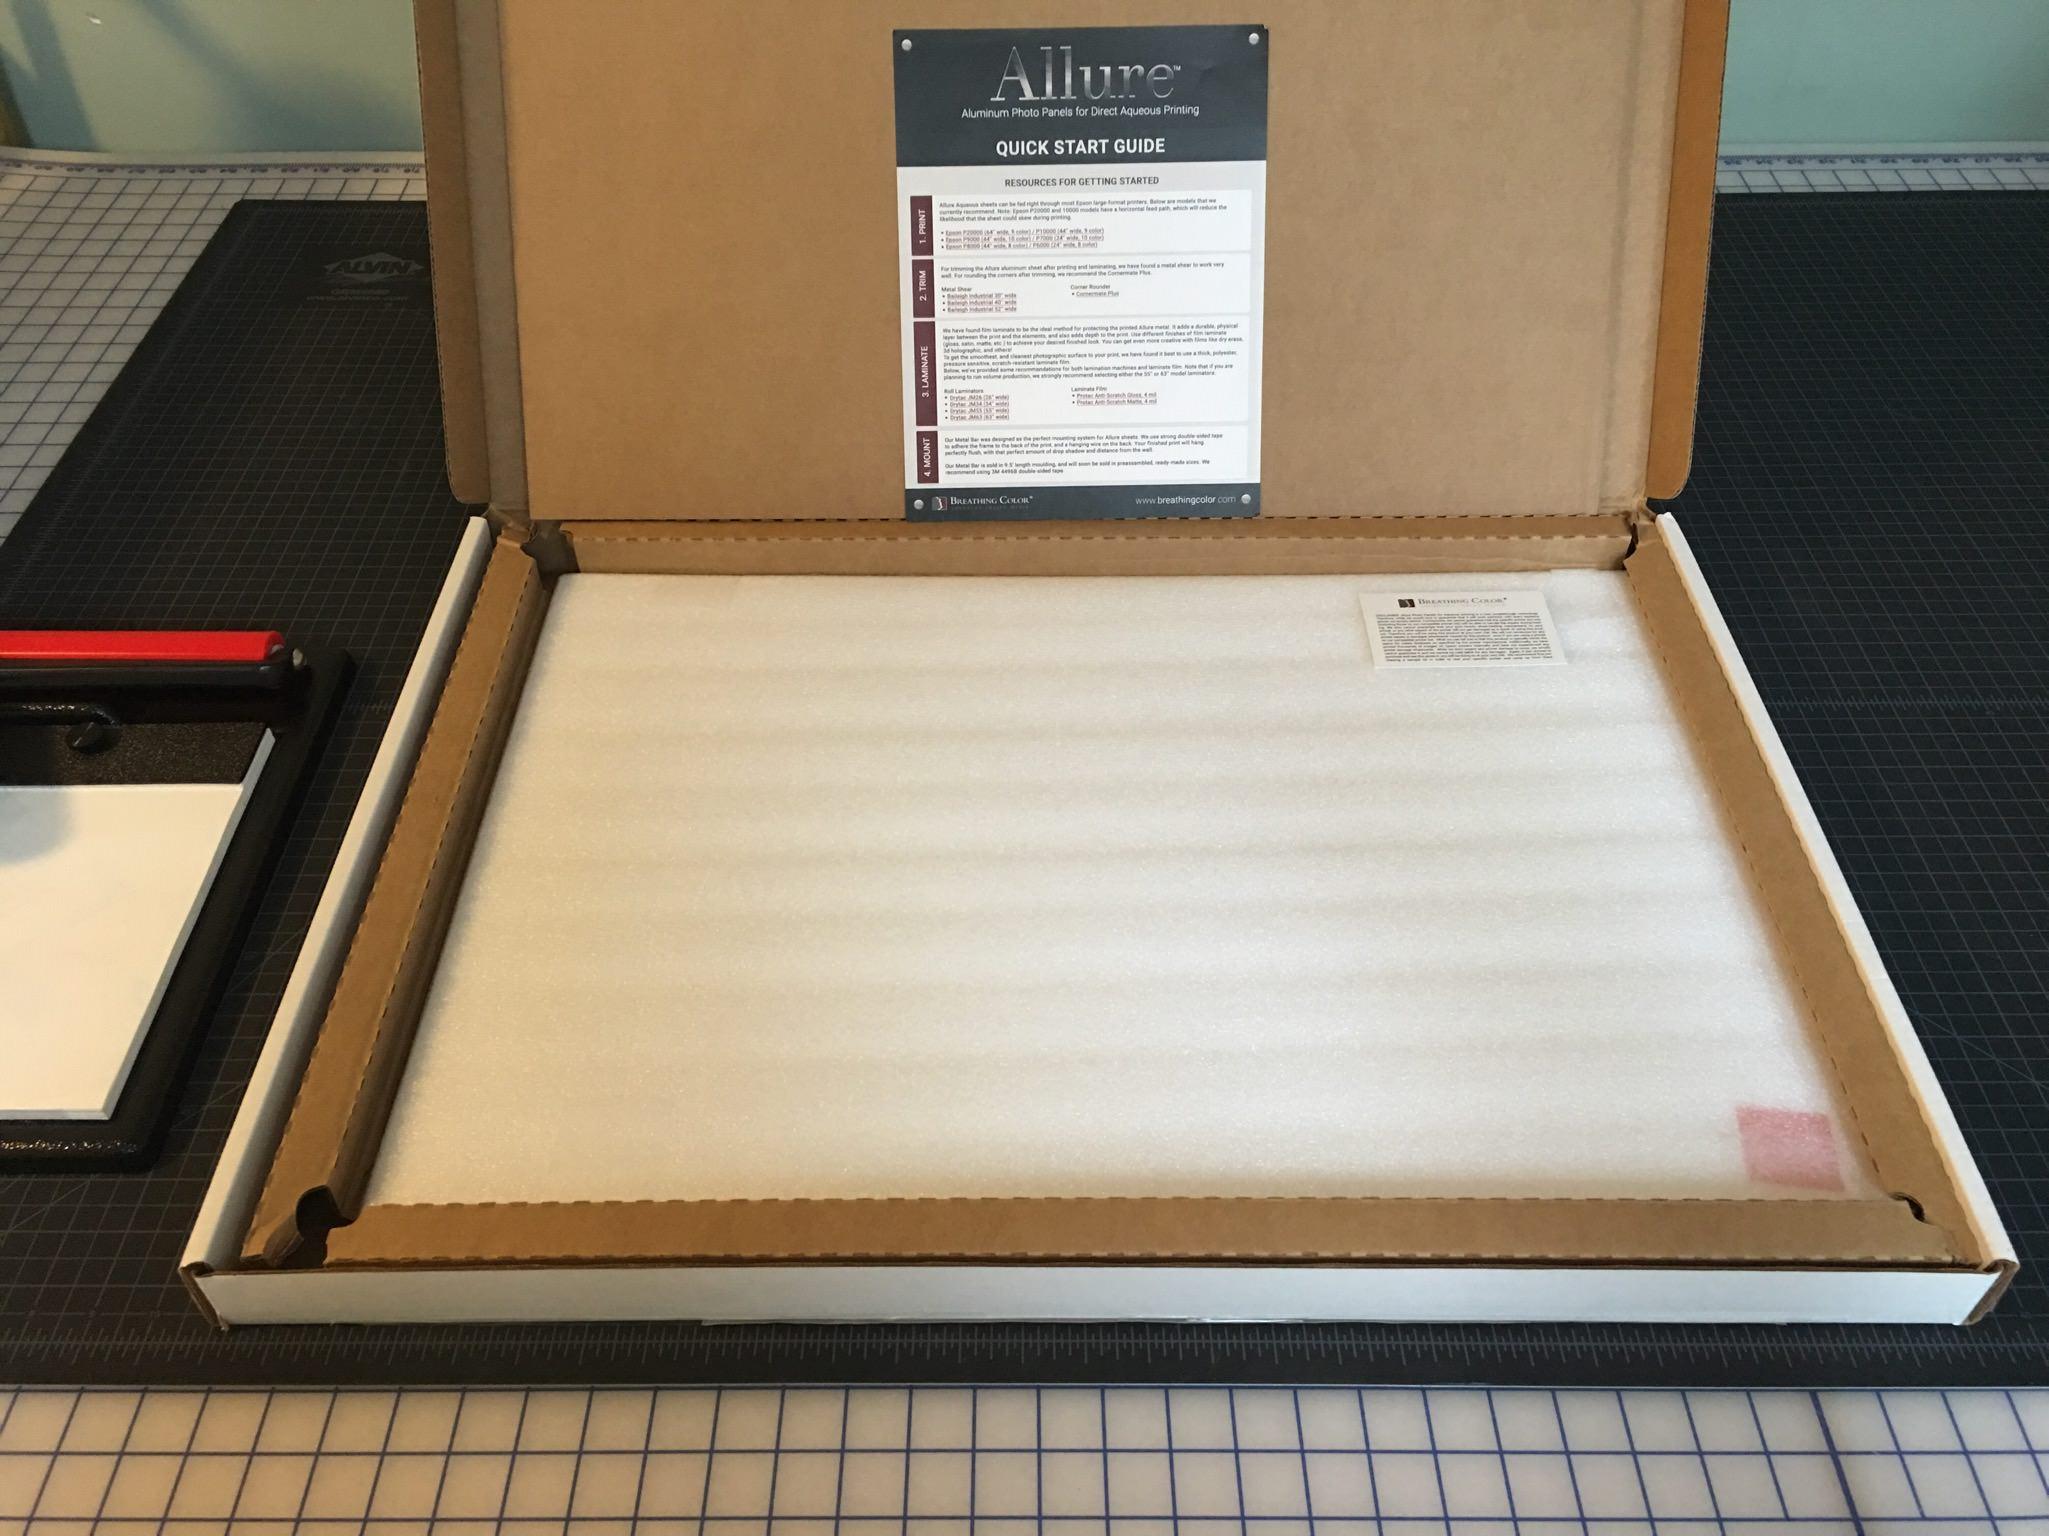 metal printing workflow allure photo panels